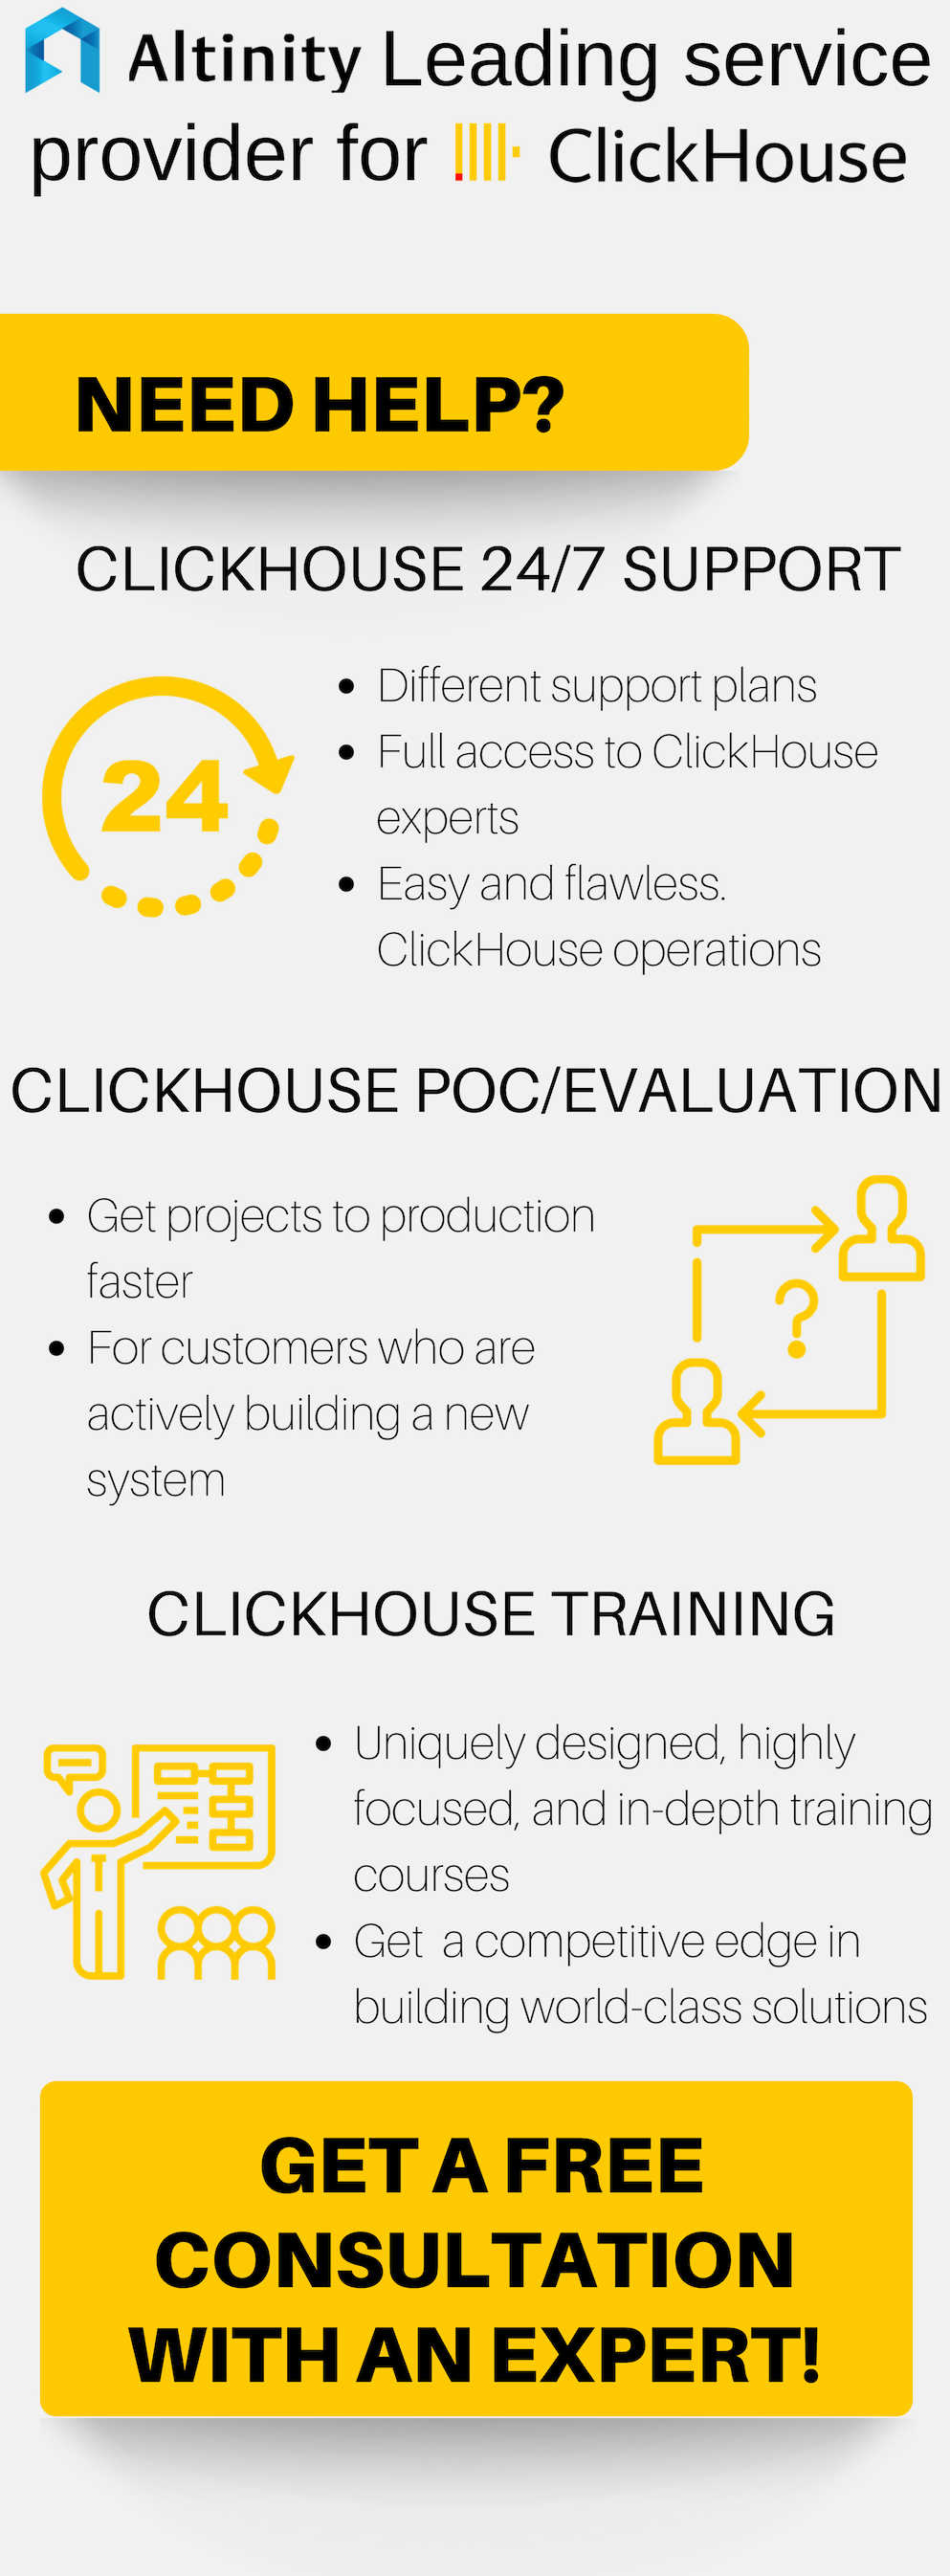 Logstash with ClickHouse — Altinity